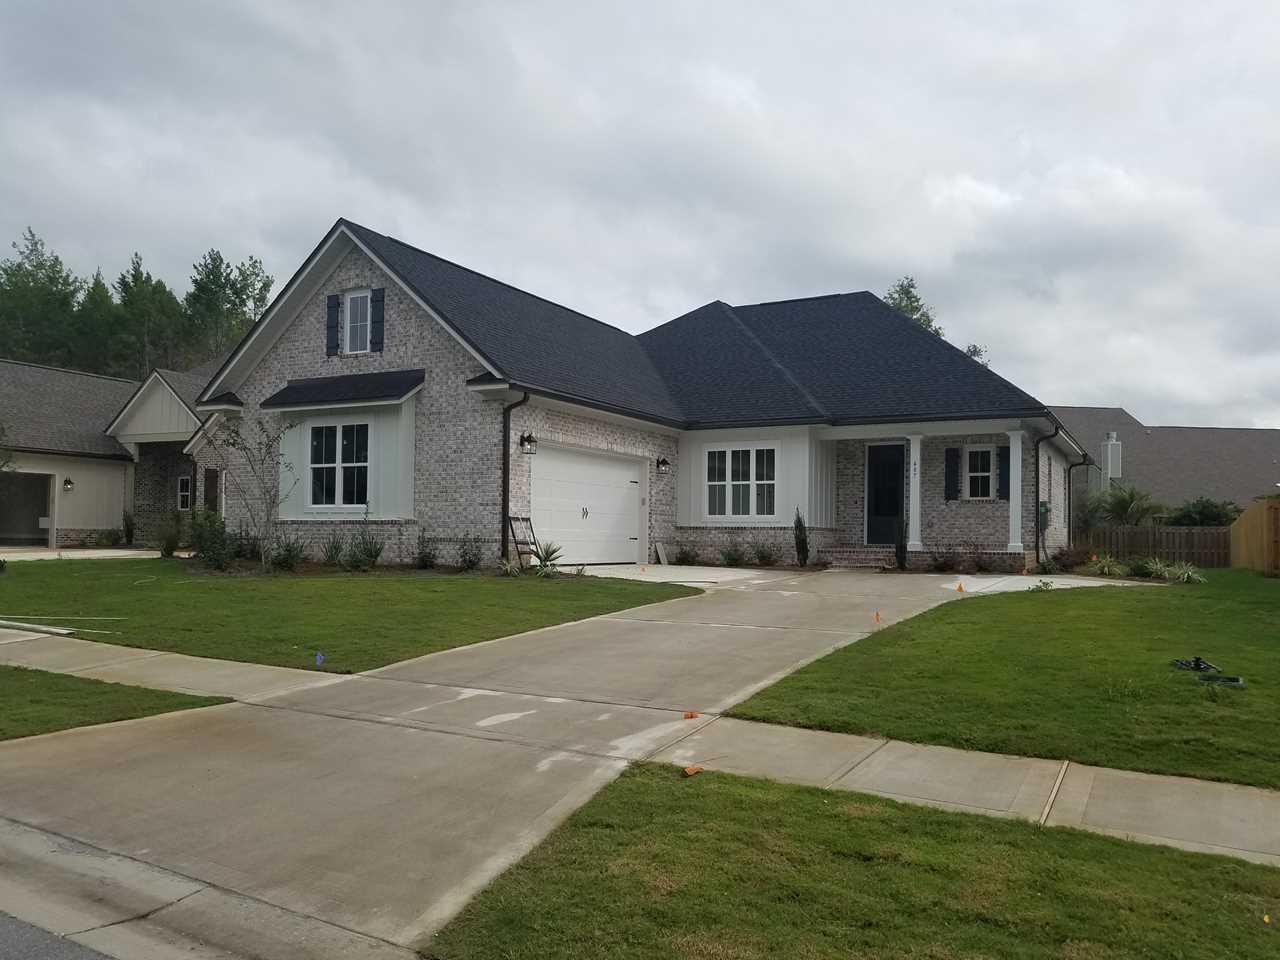 Lot 55 Meadow Lake Drive Freeport Fl 32439 Mls 813651